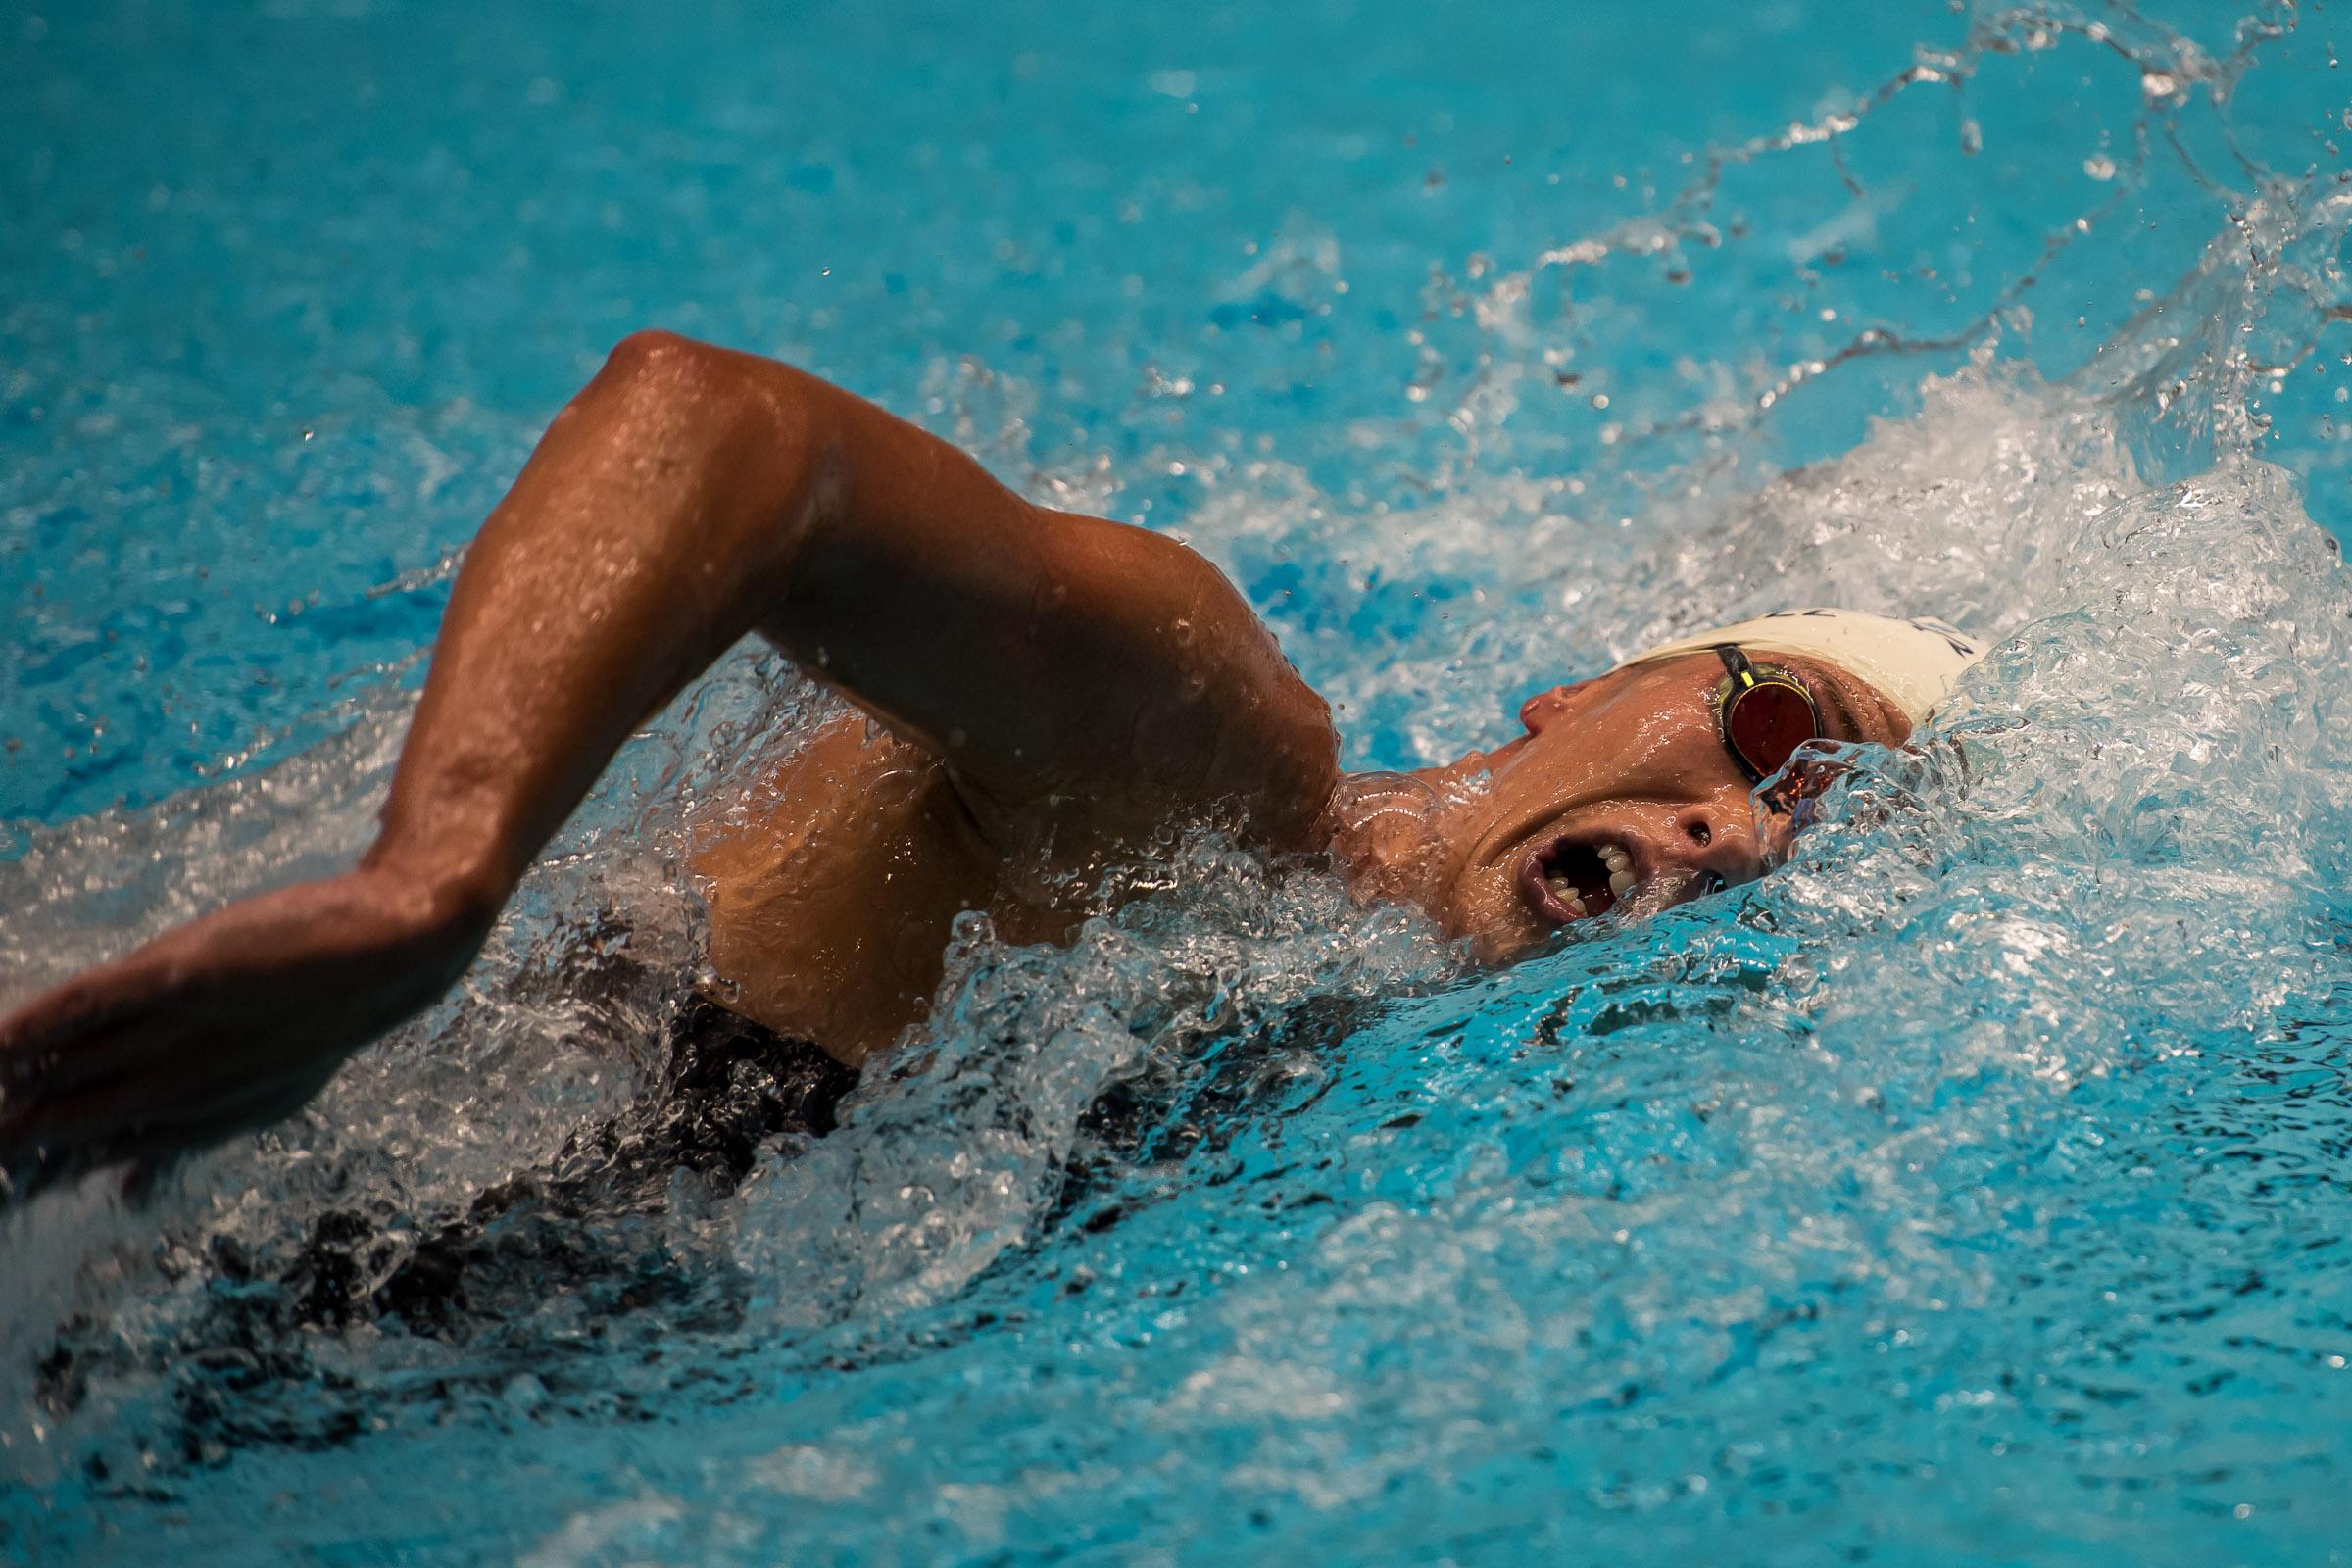 Ashley Twichell, David Heron Take 5K at US Open Water Nationals - Swimming World News